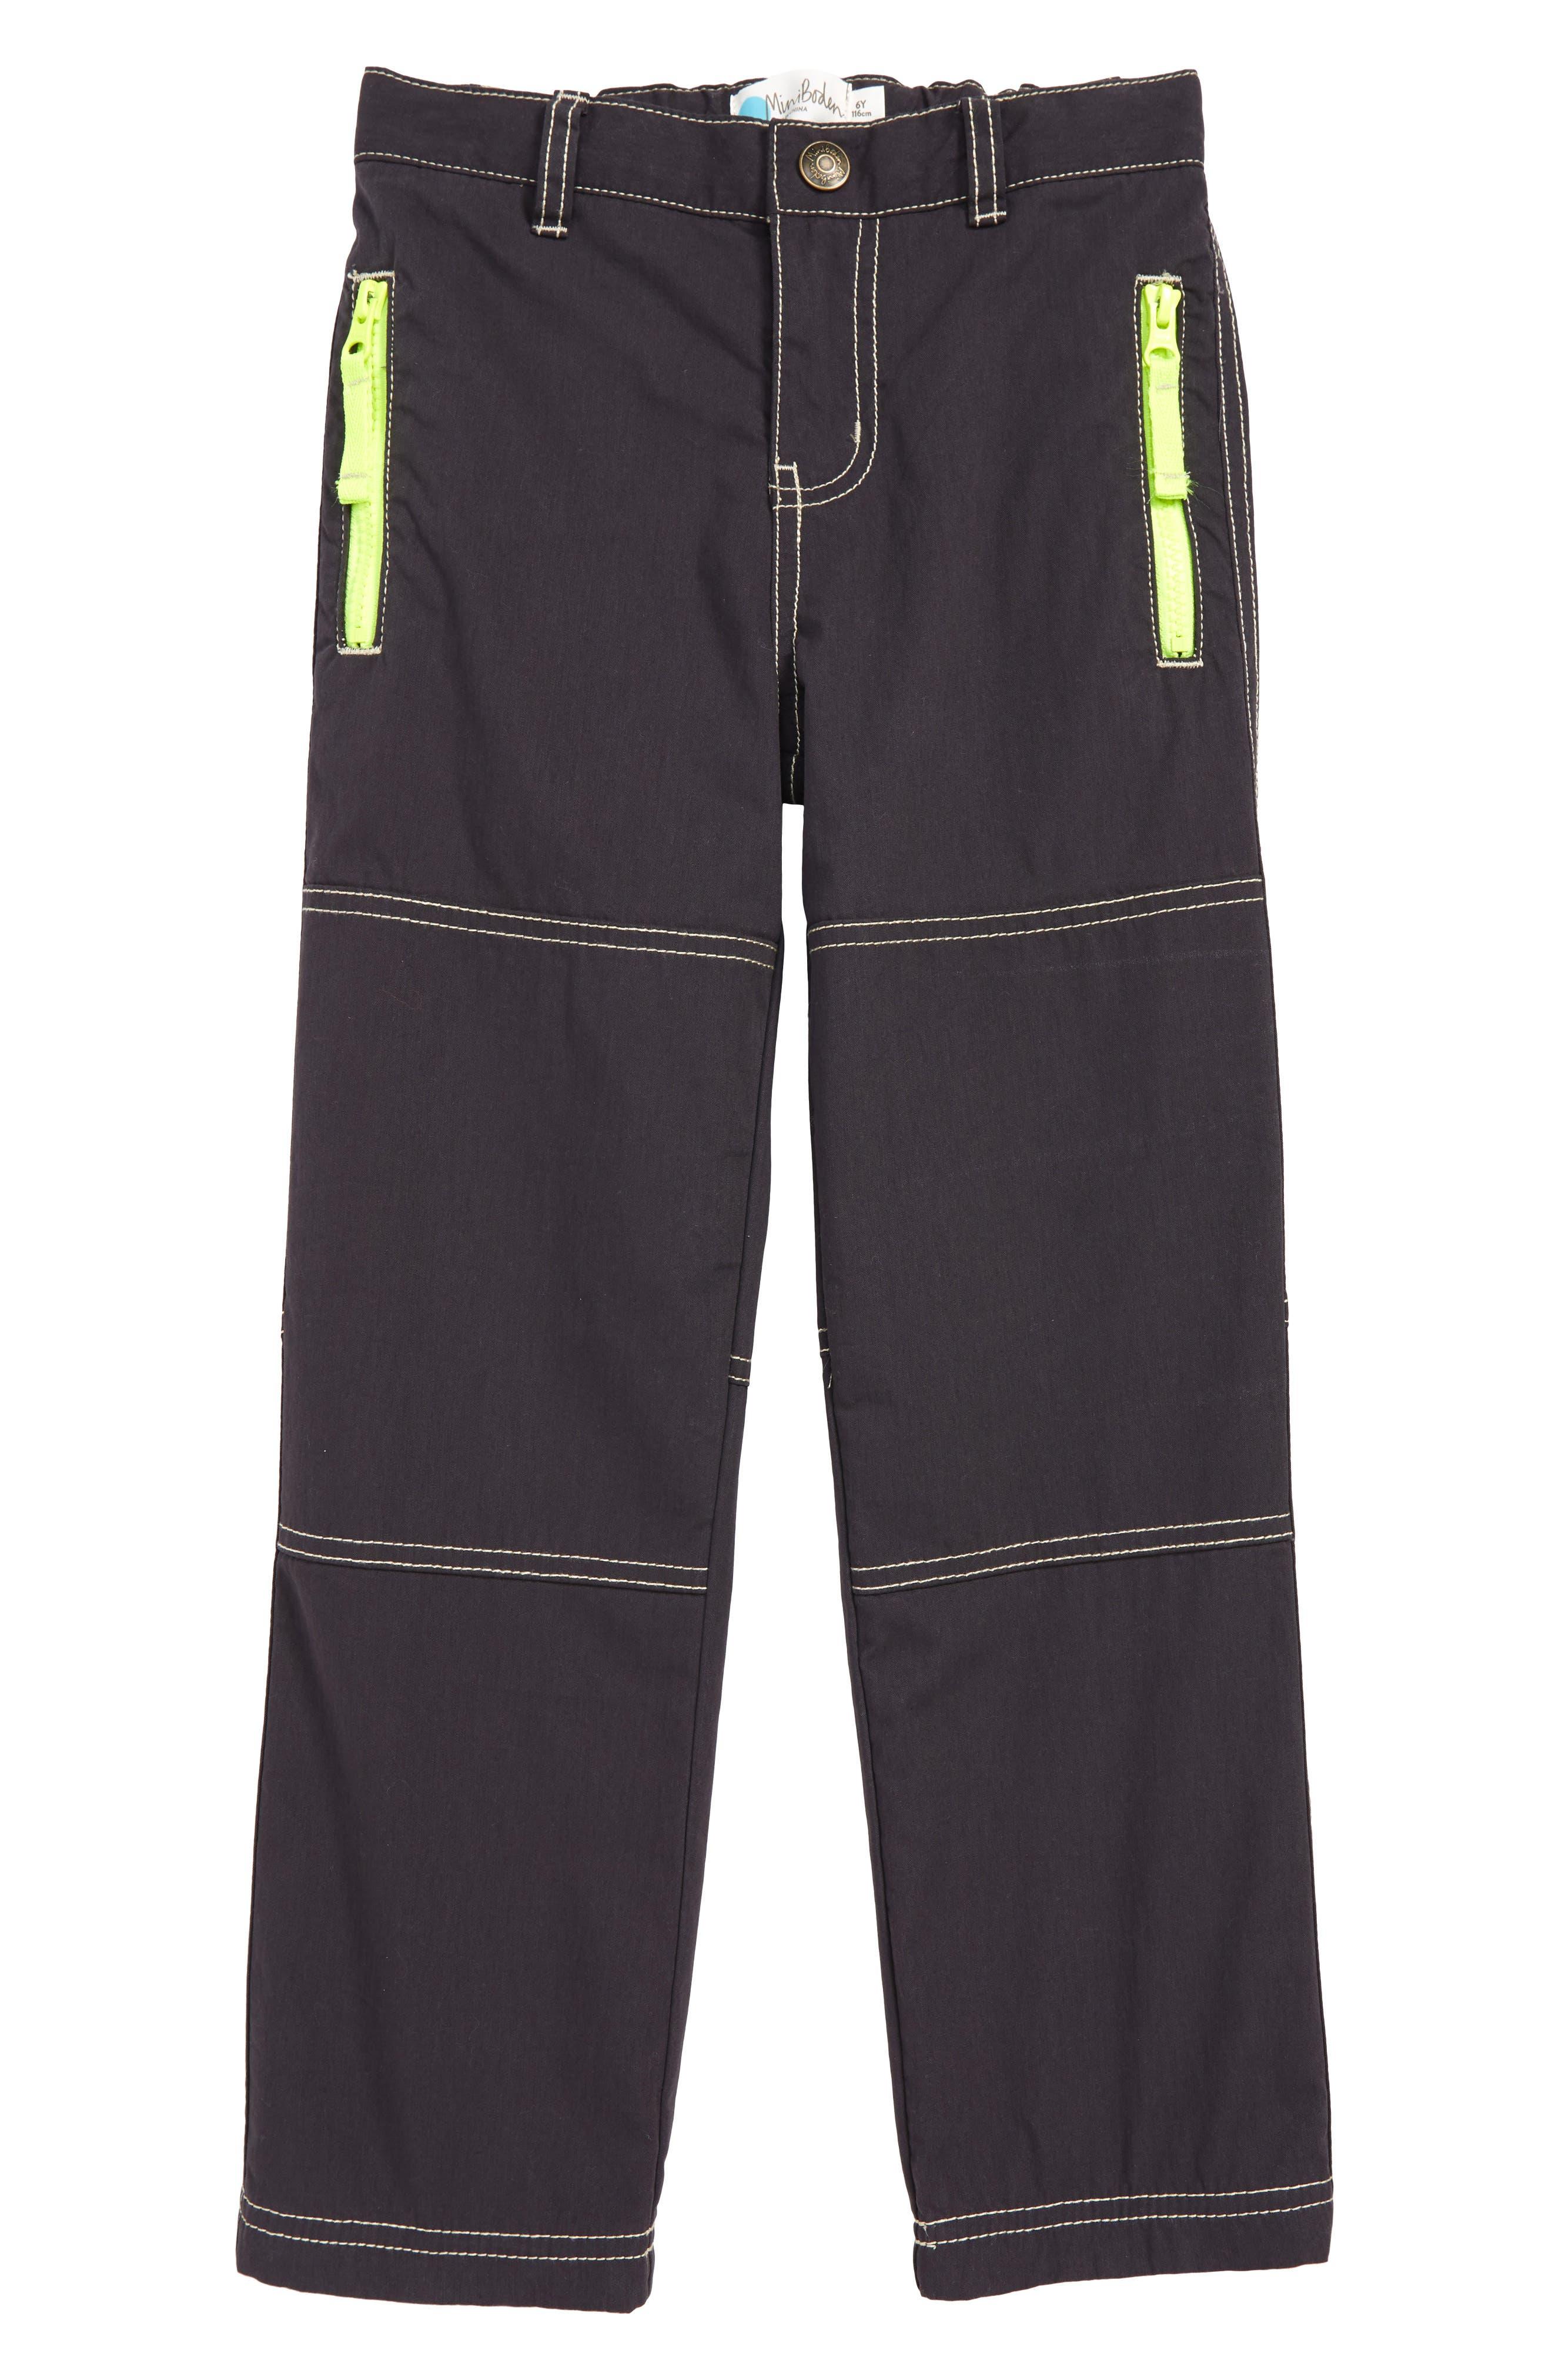 Boys Mini Boden Lined Skate Pants Size 7Y  Grey